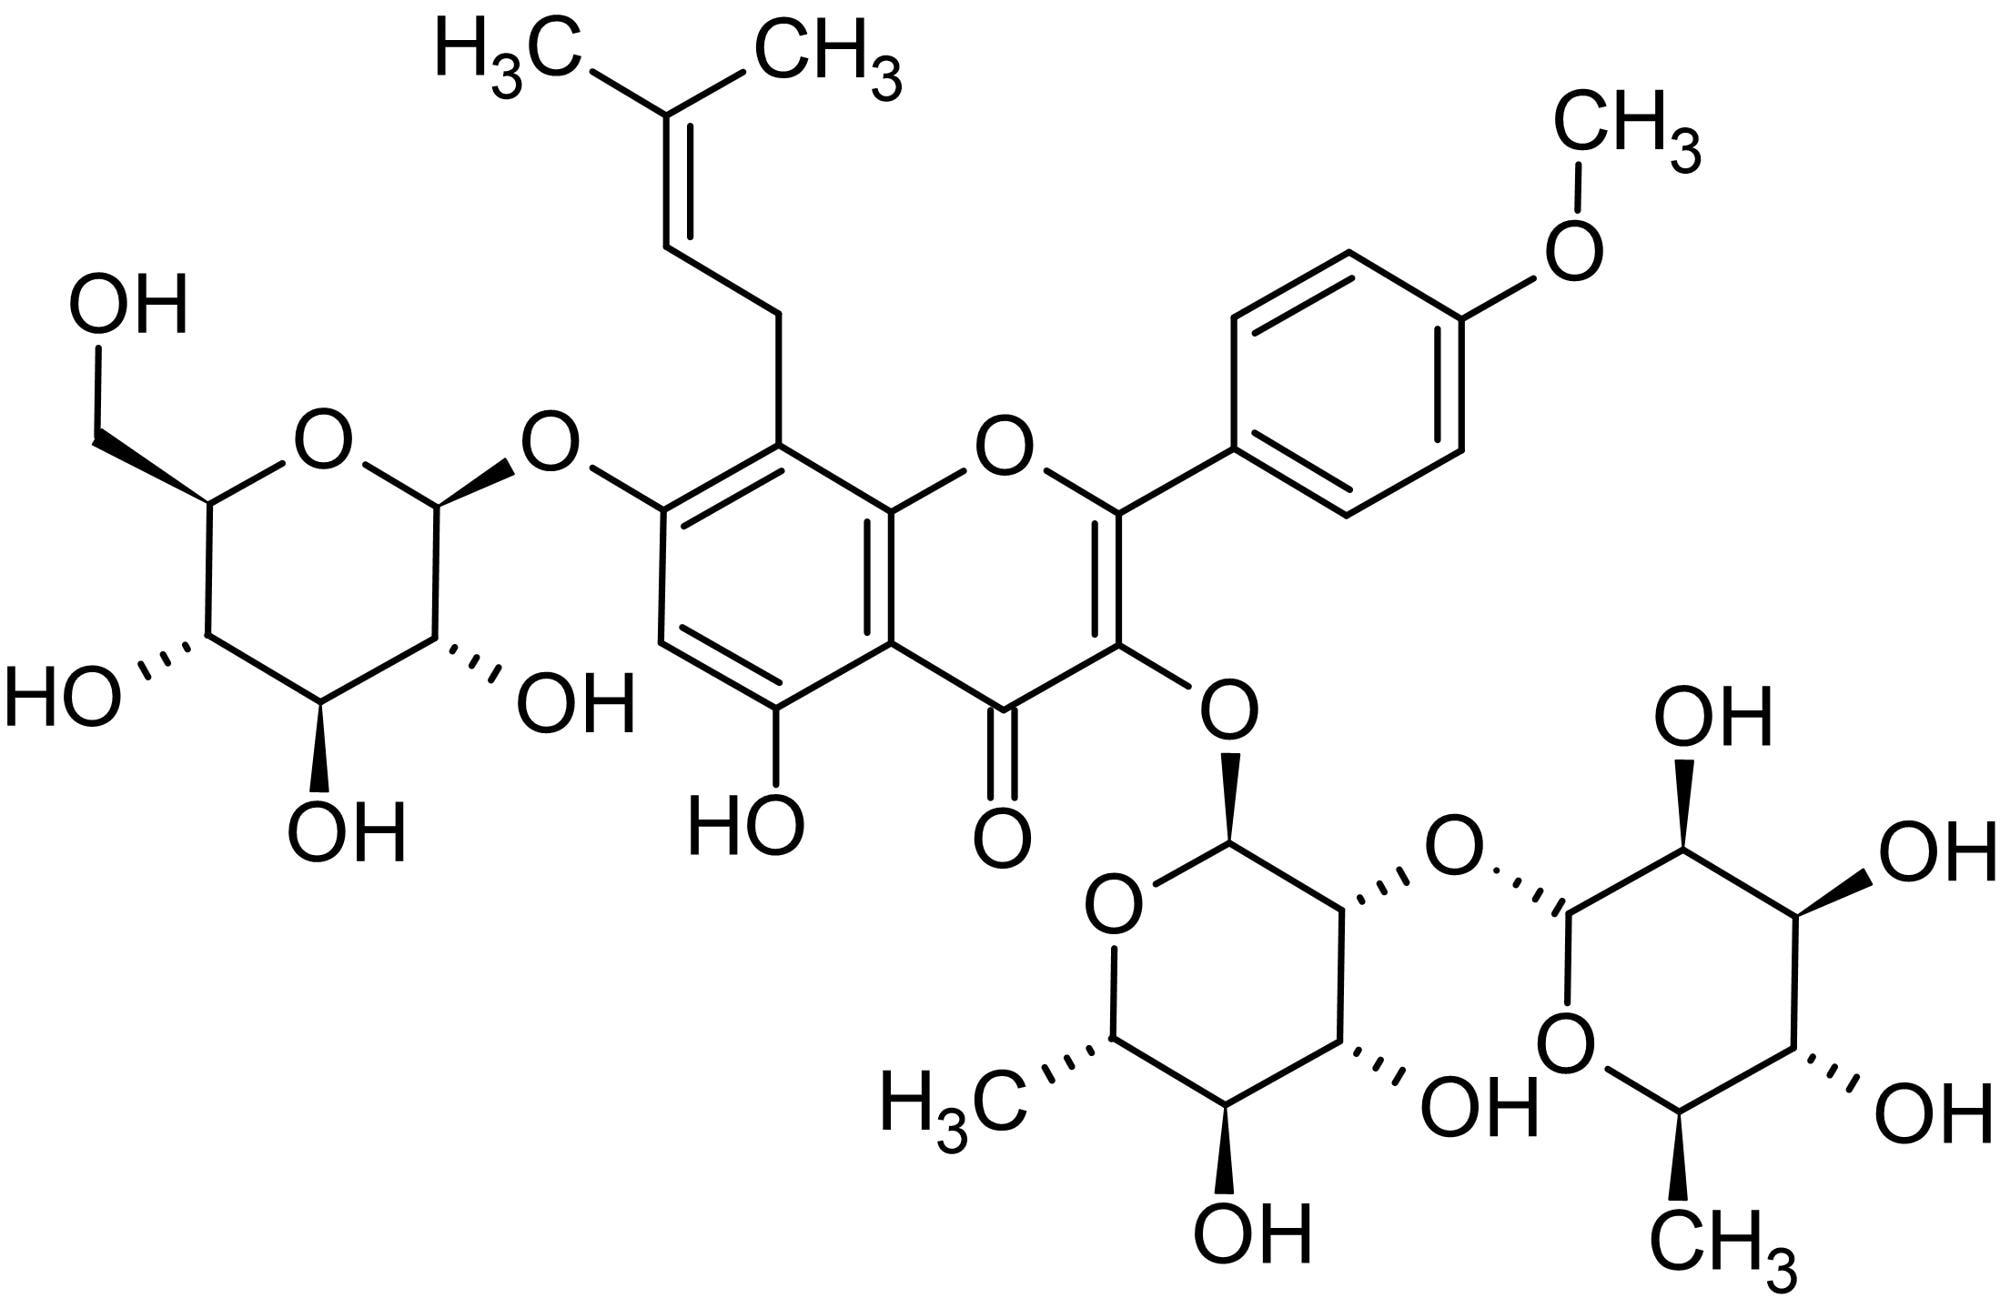 Chemical Structure - Epimedin C, Flavonoid (ab143614)